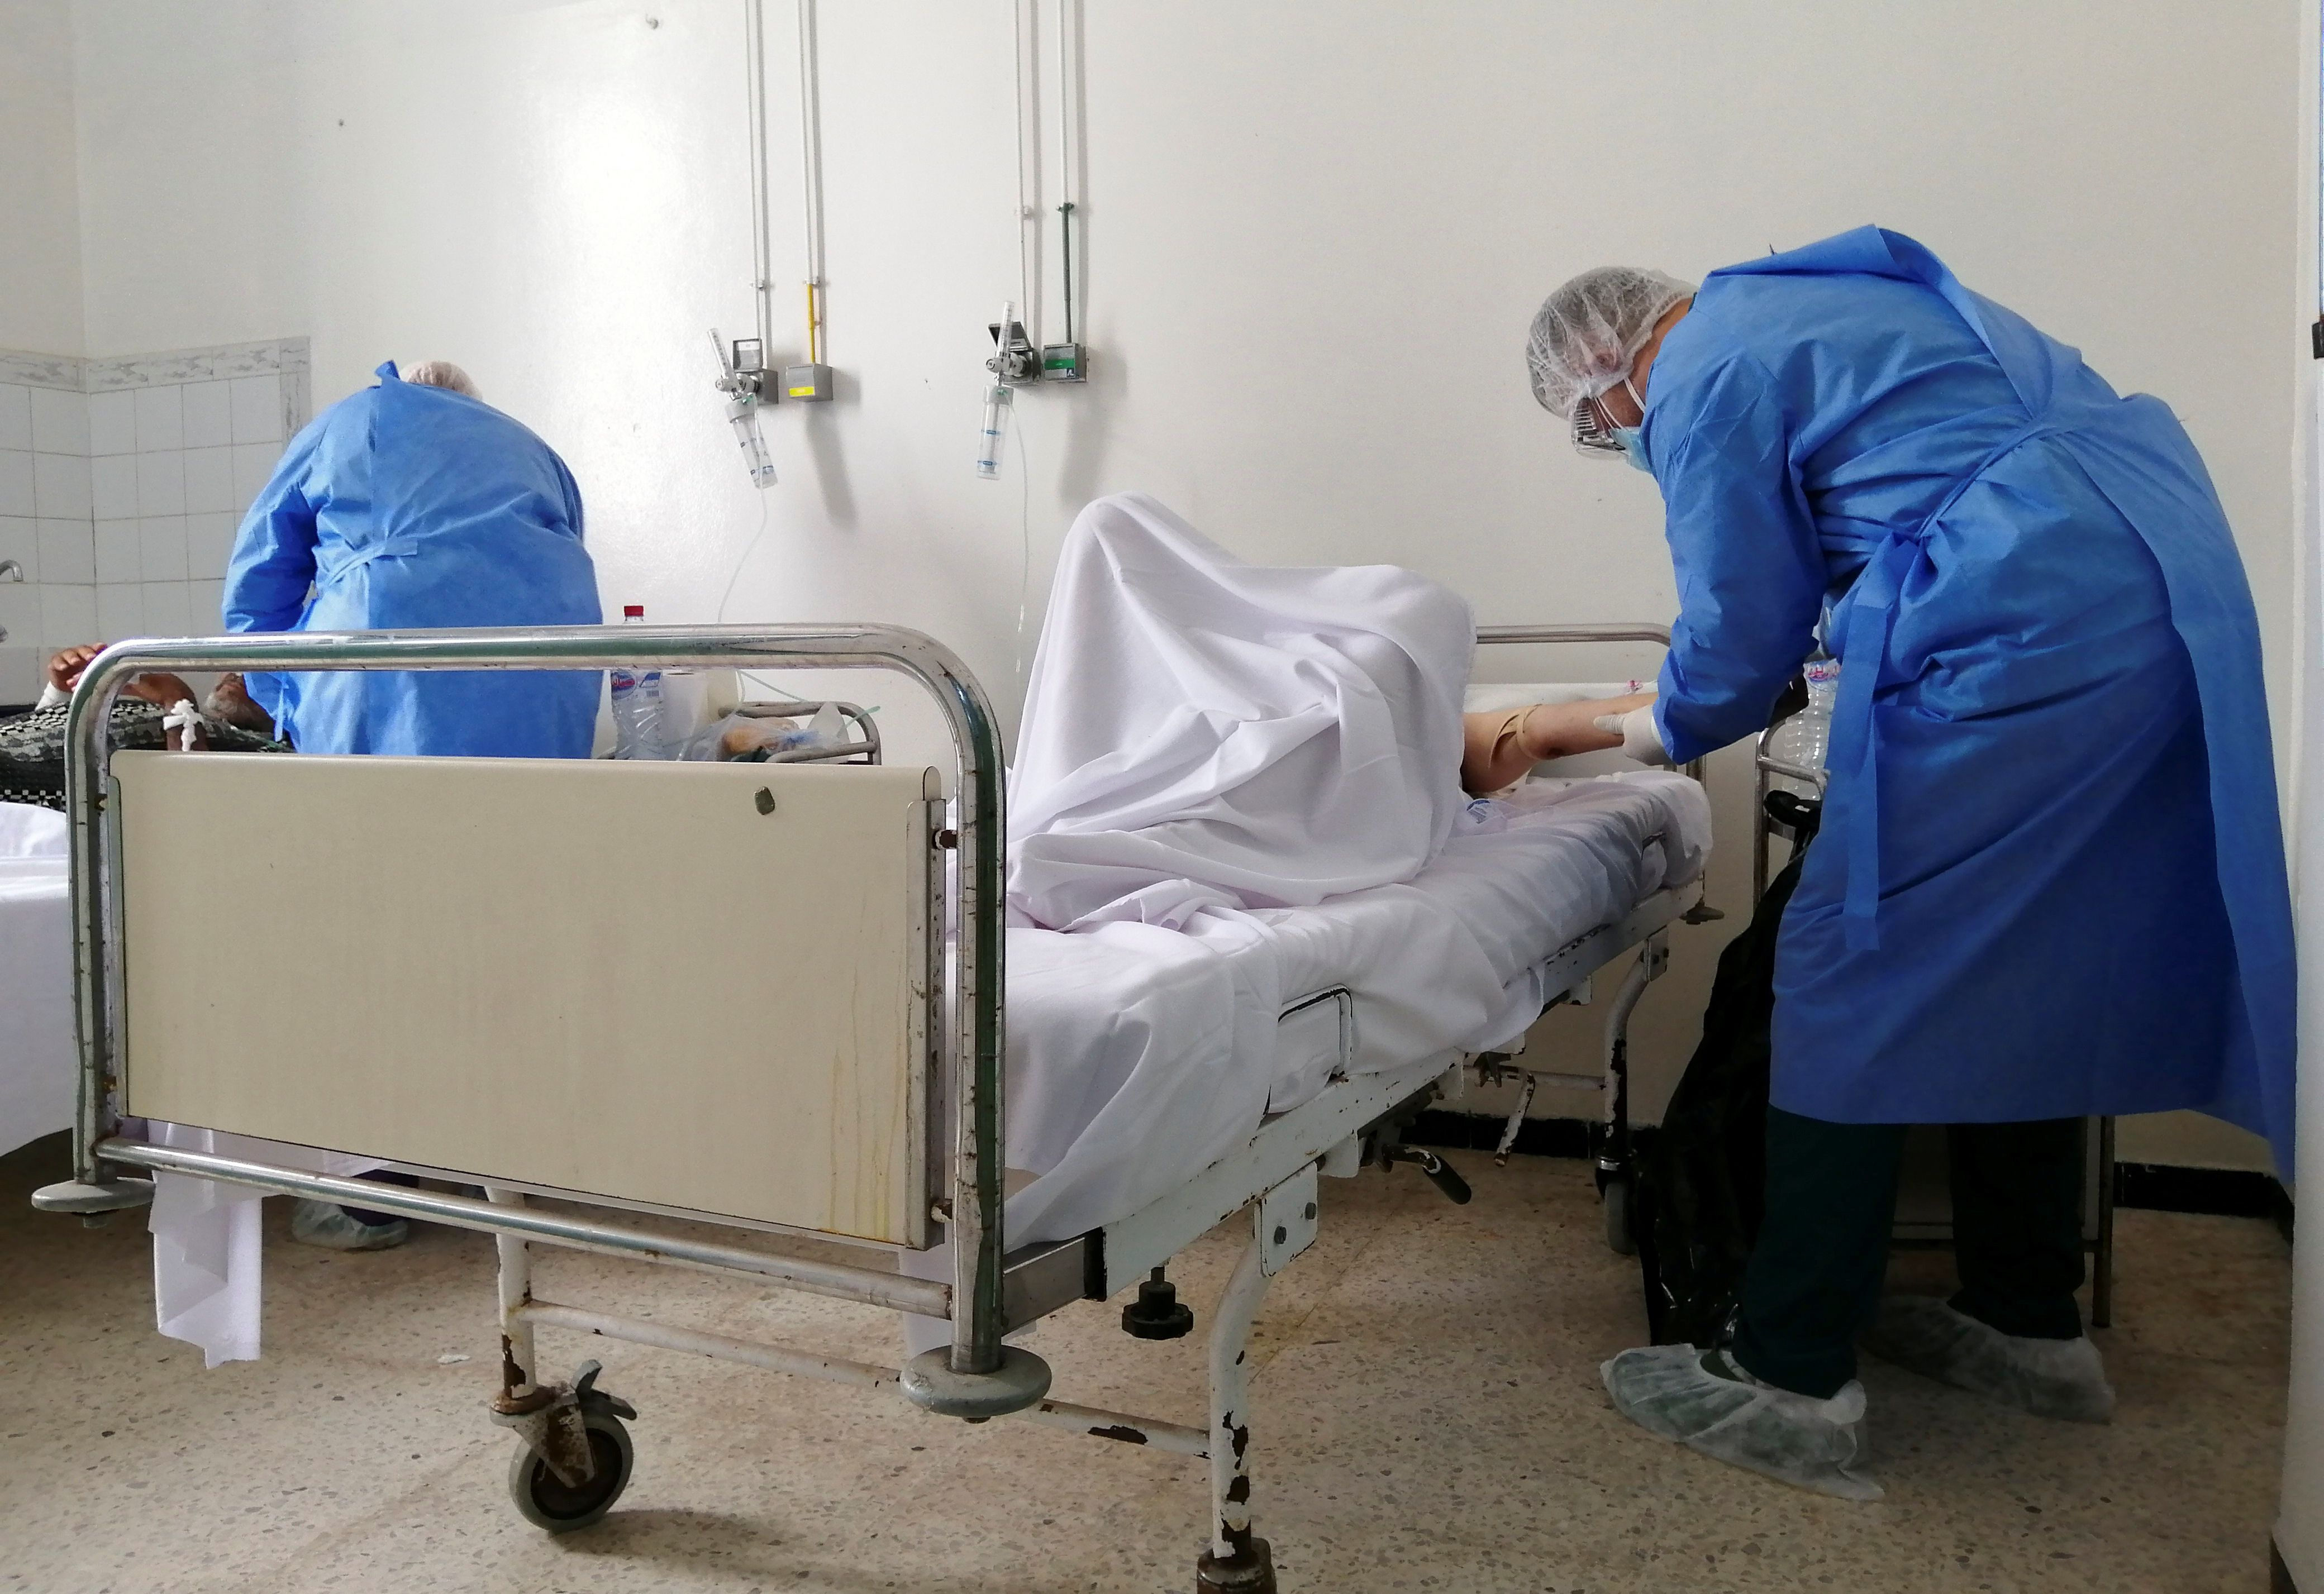 Se trata de un experimento peligroso, dijeron (REUTERS/Jihed Abidellaoui)